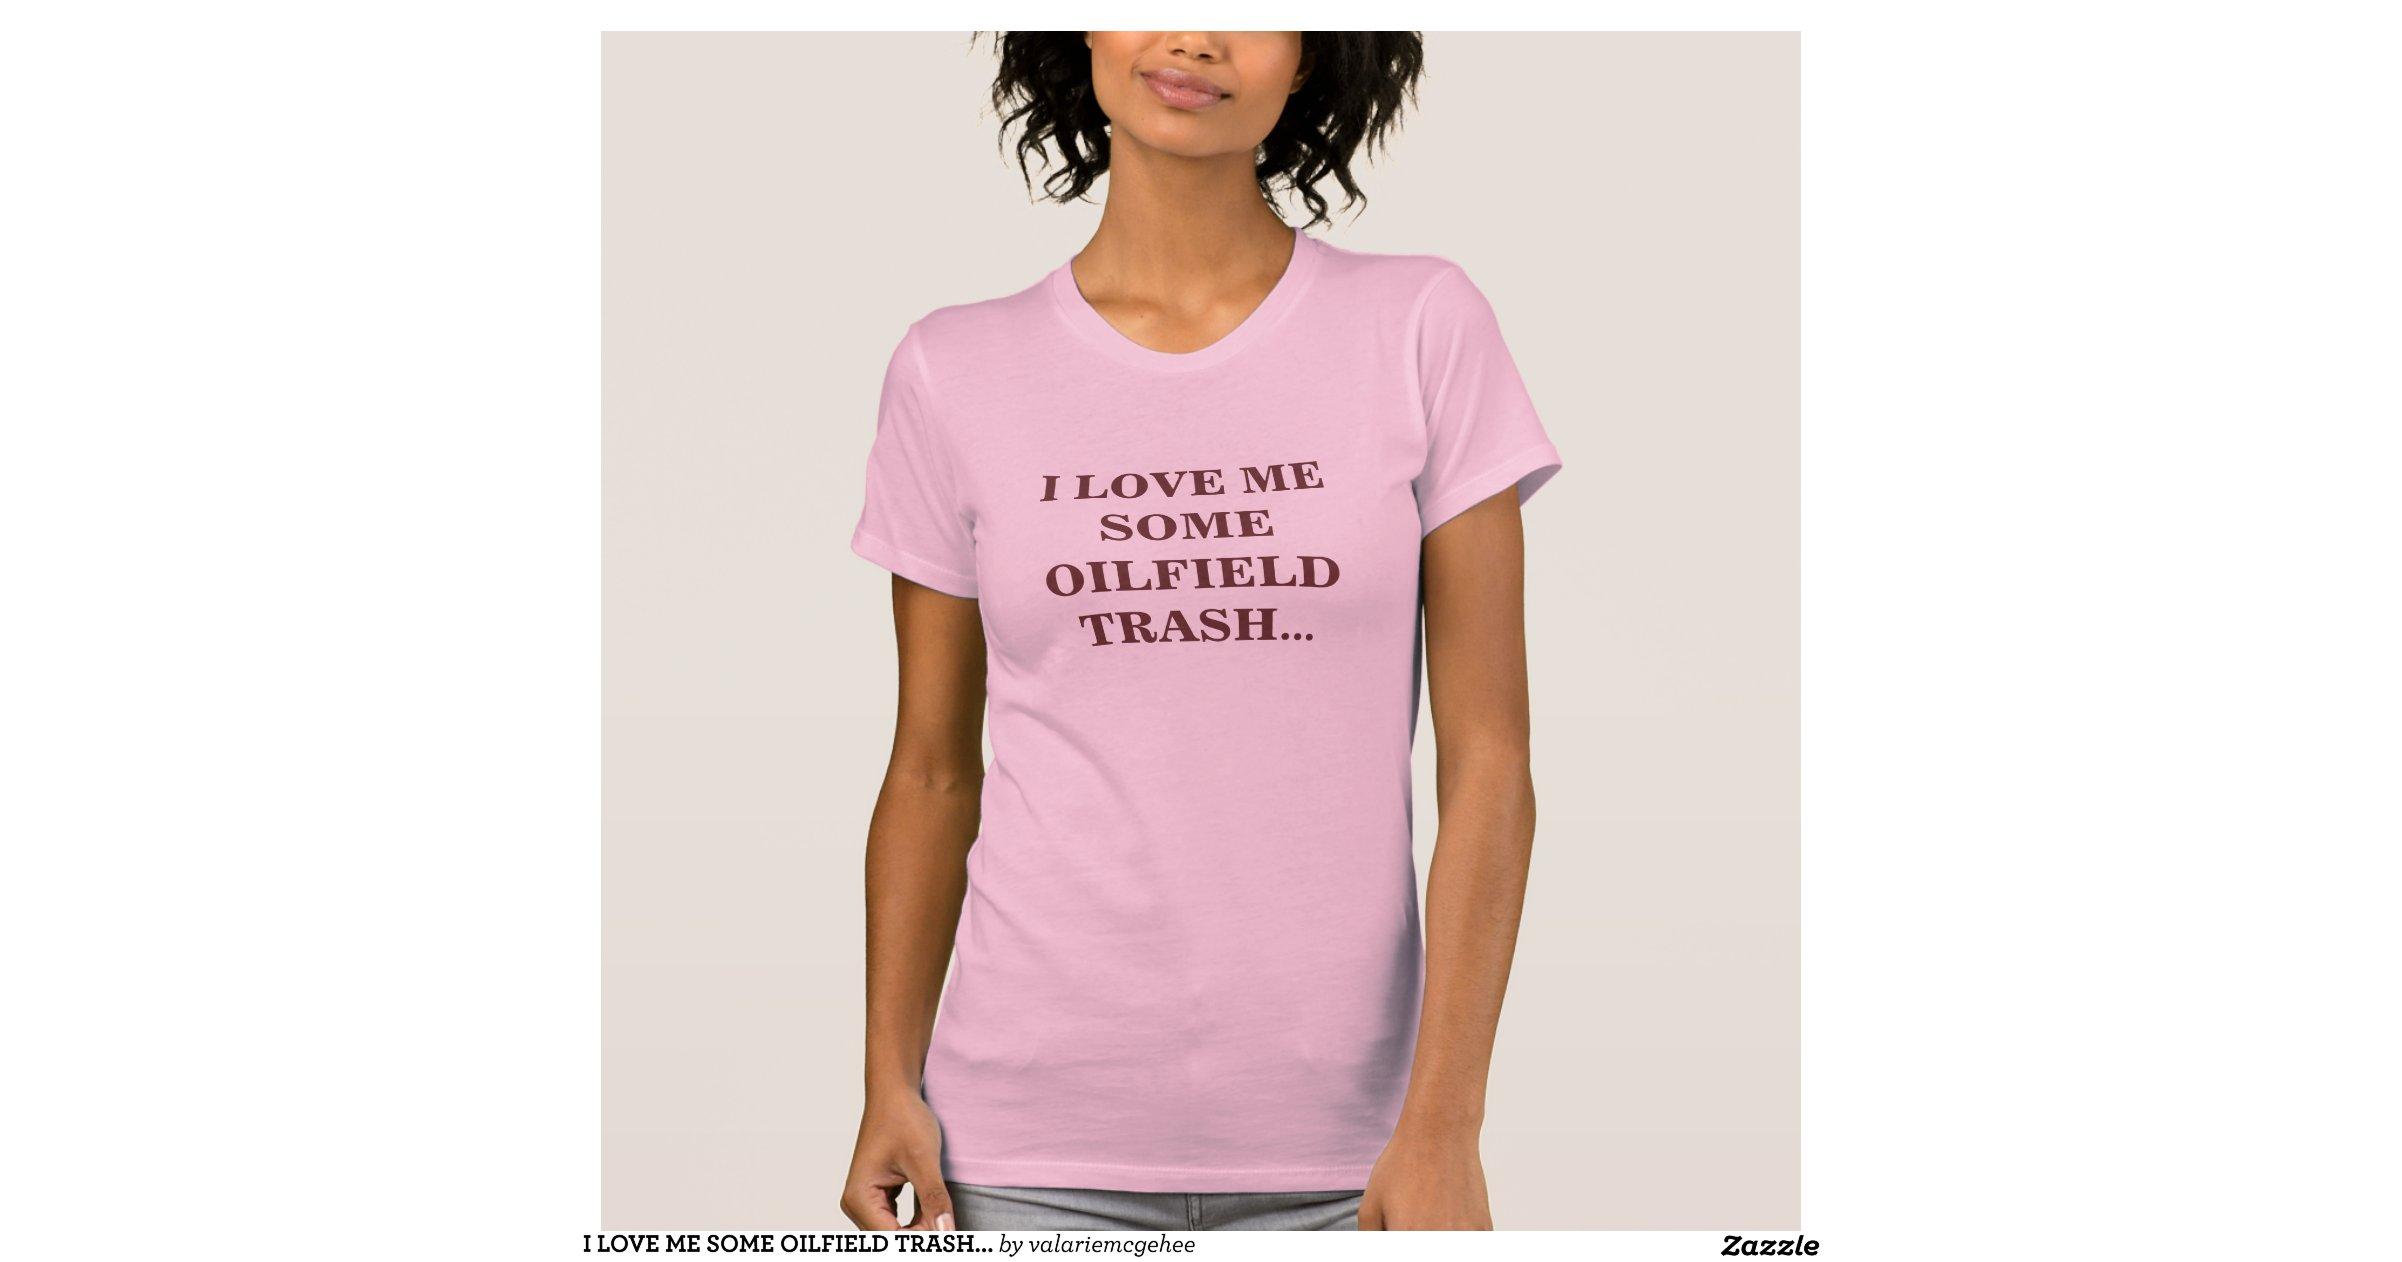 I Love Me Some Oilfield Trash Tee Shirts Zazzle